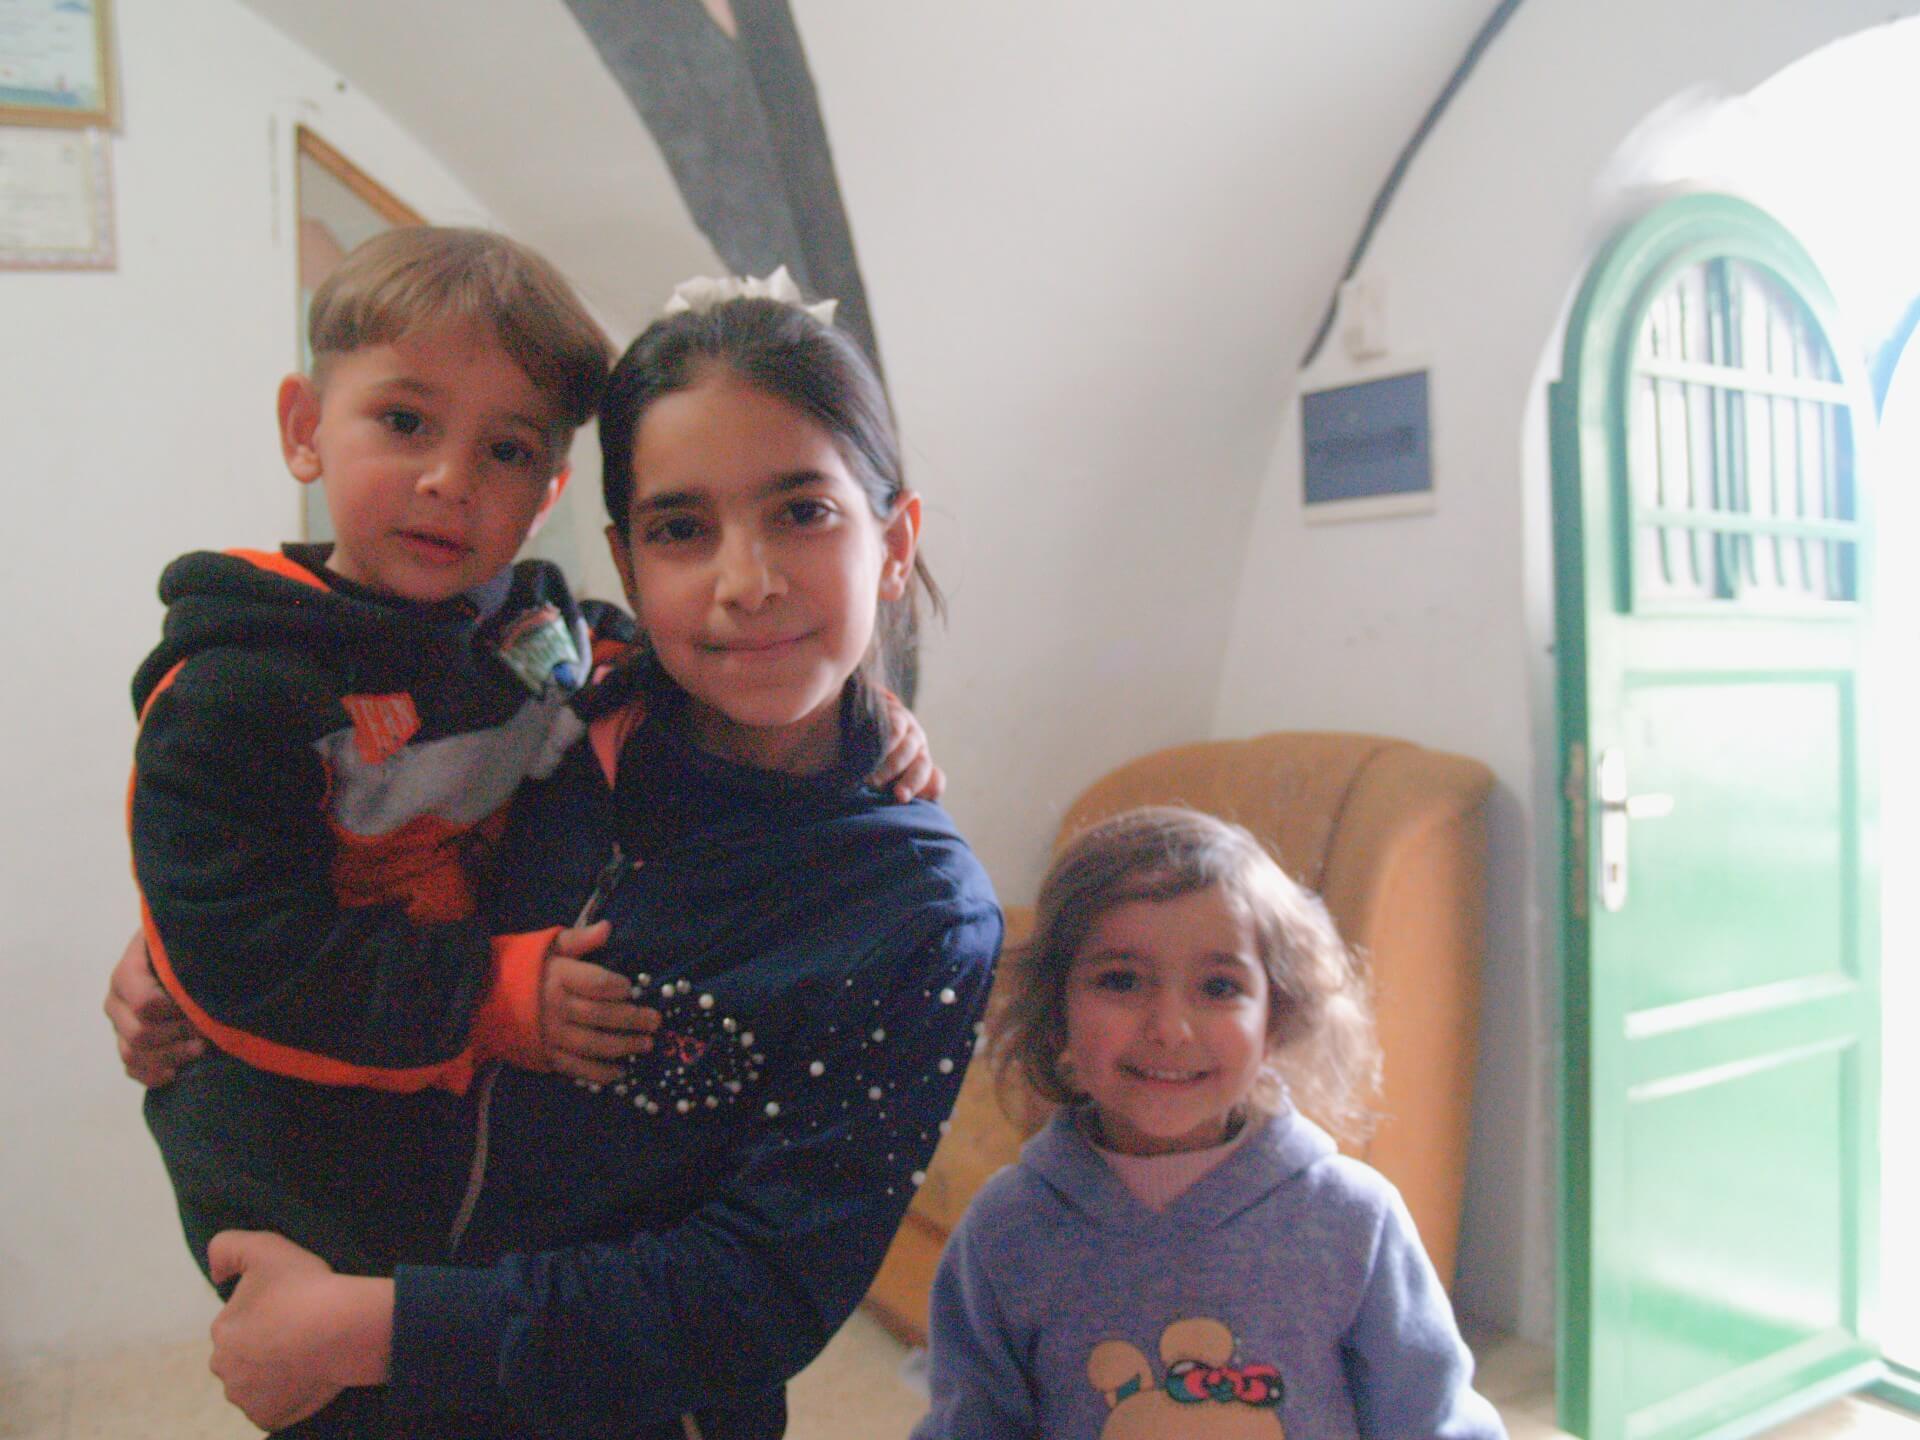 Boshra Jabr's children in their home in Hebron. (Photo: Megan Giovannetti)